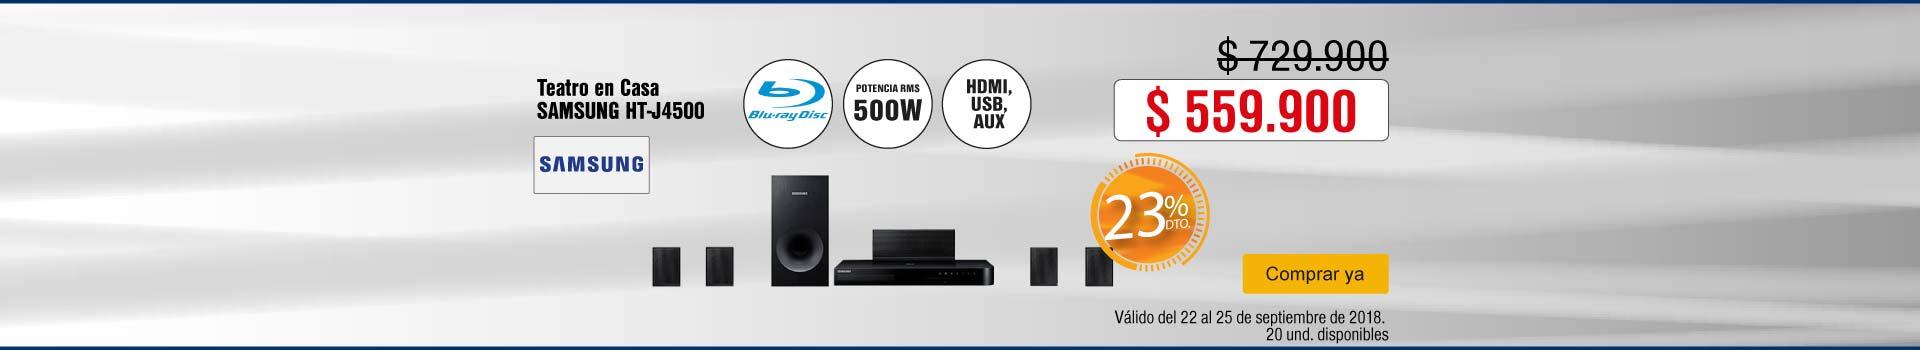 AK-KT-BCAT-7-audio-PP---Samsung-HT-J4500-Sep22